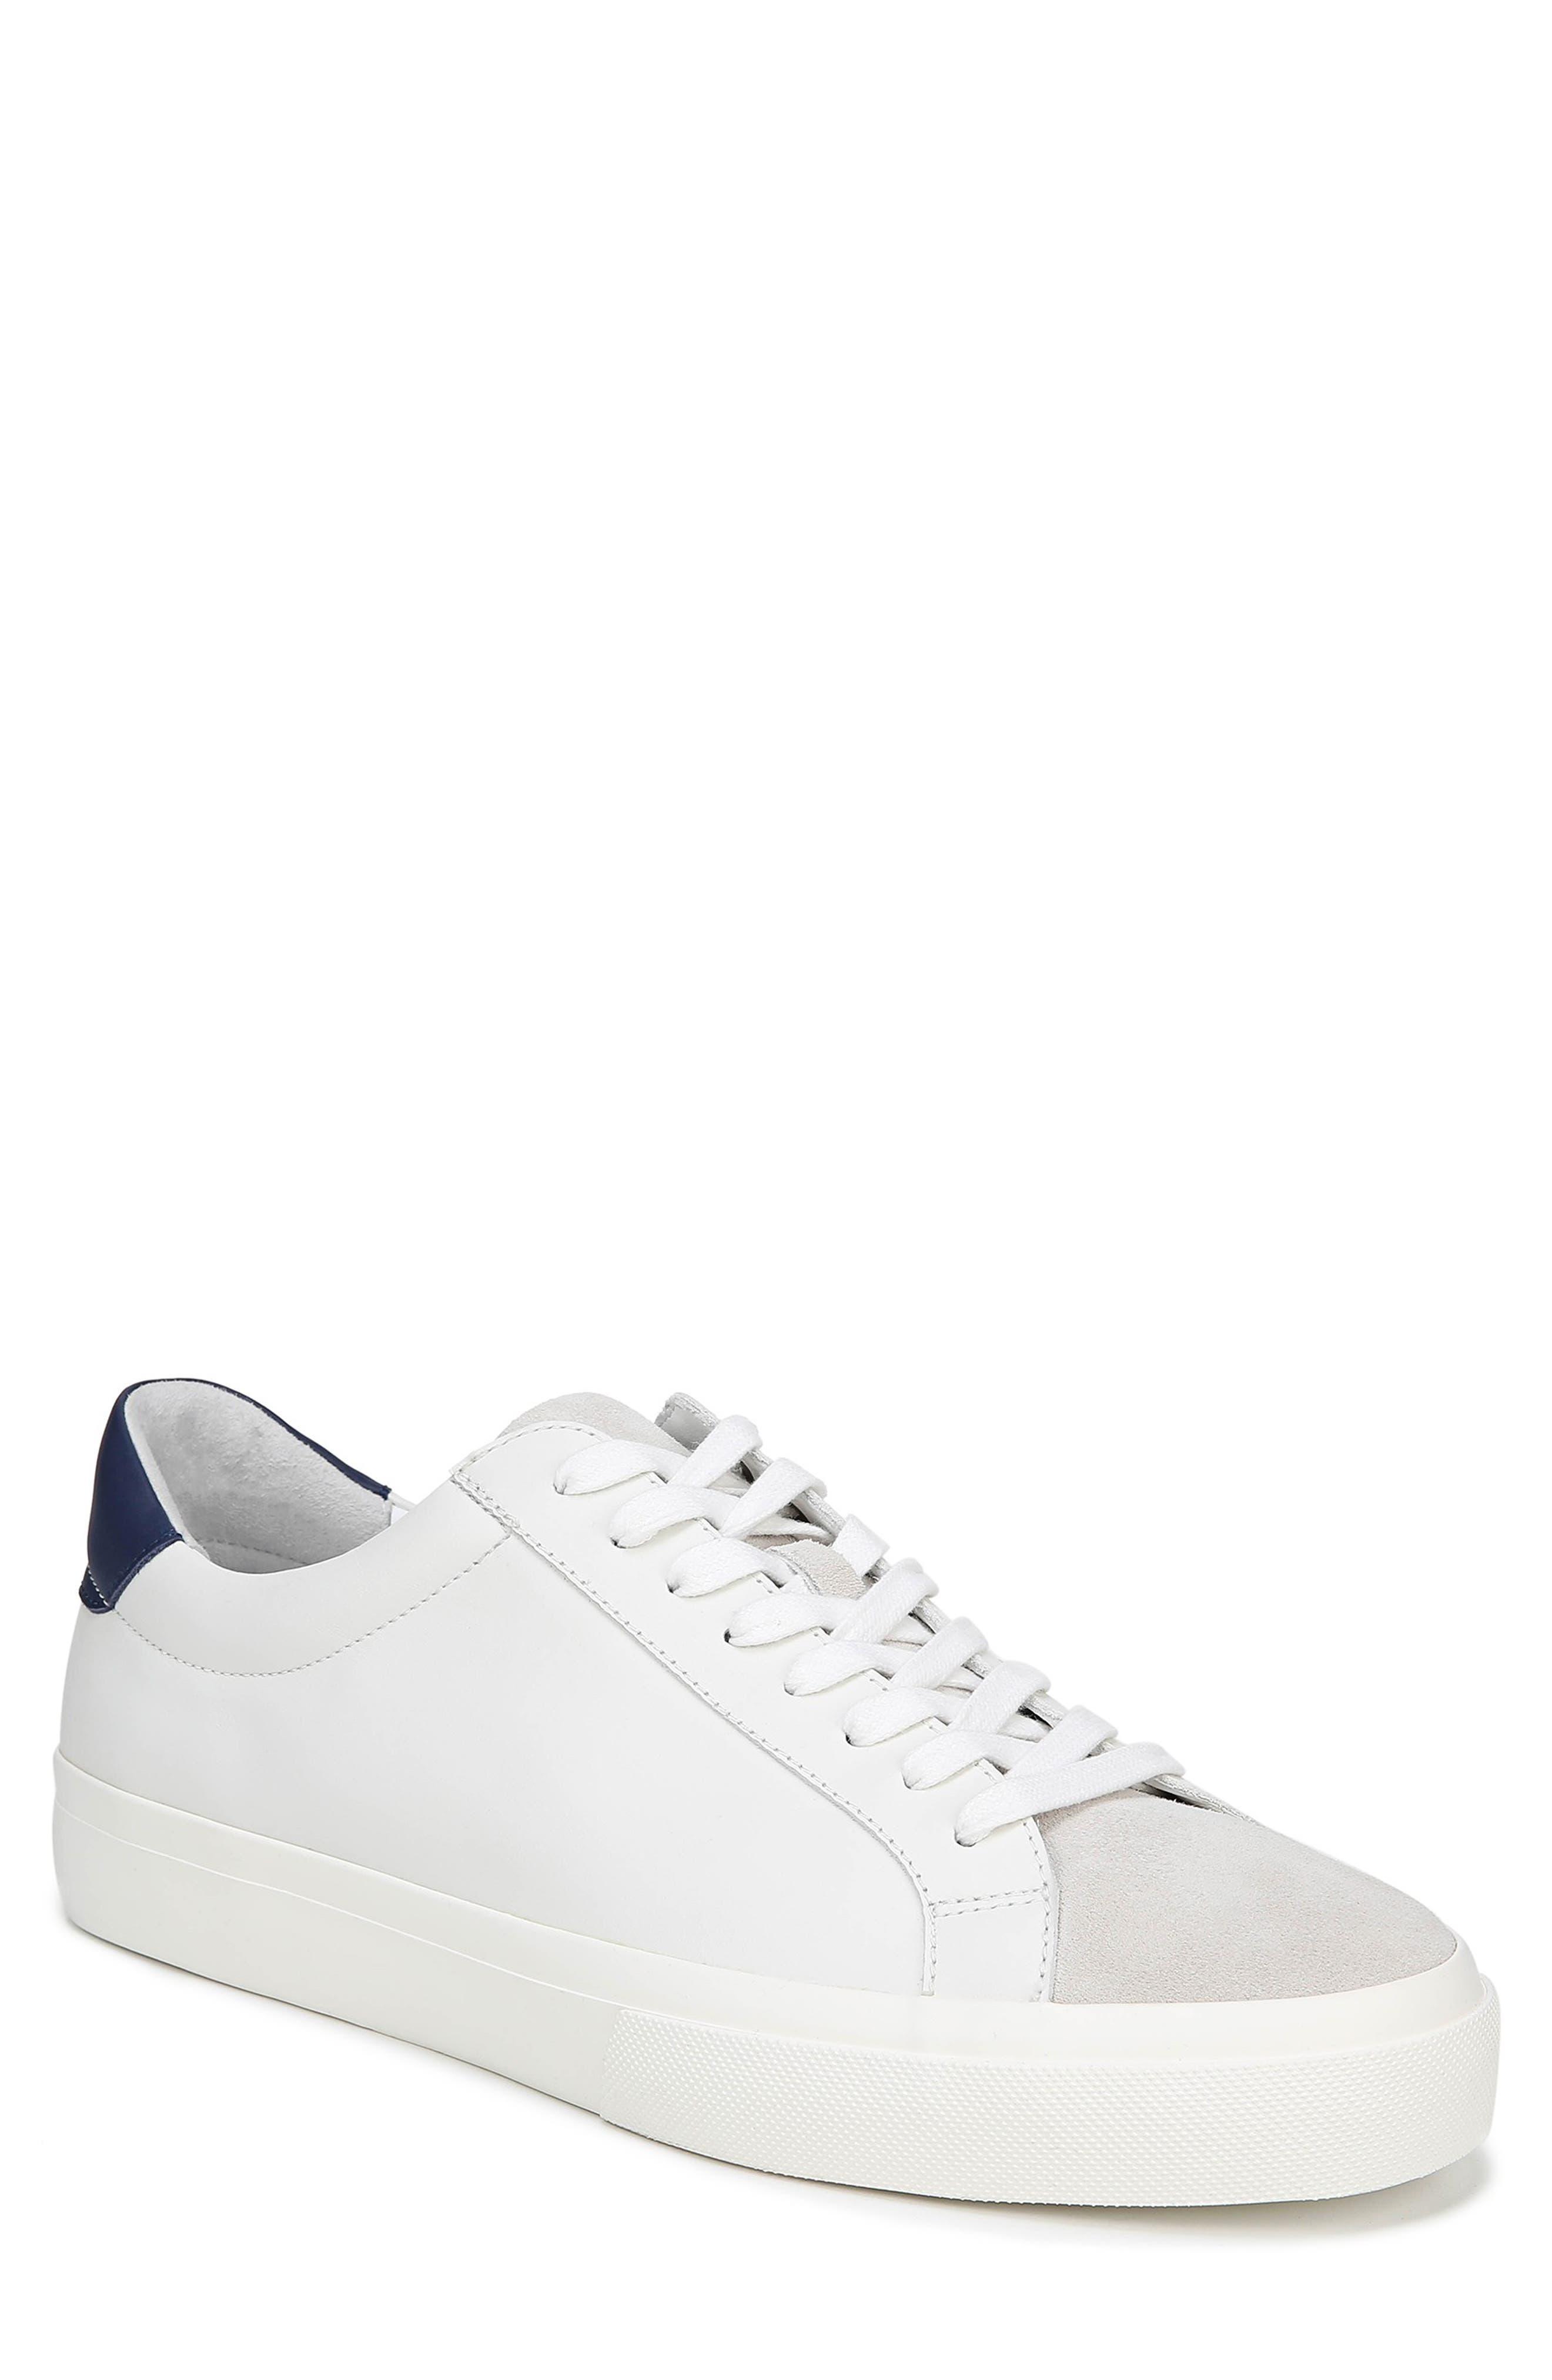 VINCE Fulton Sneaker, Main, color, WHITE